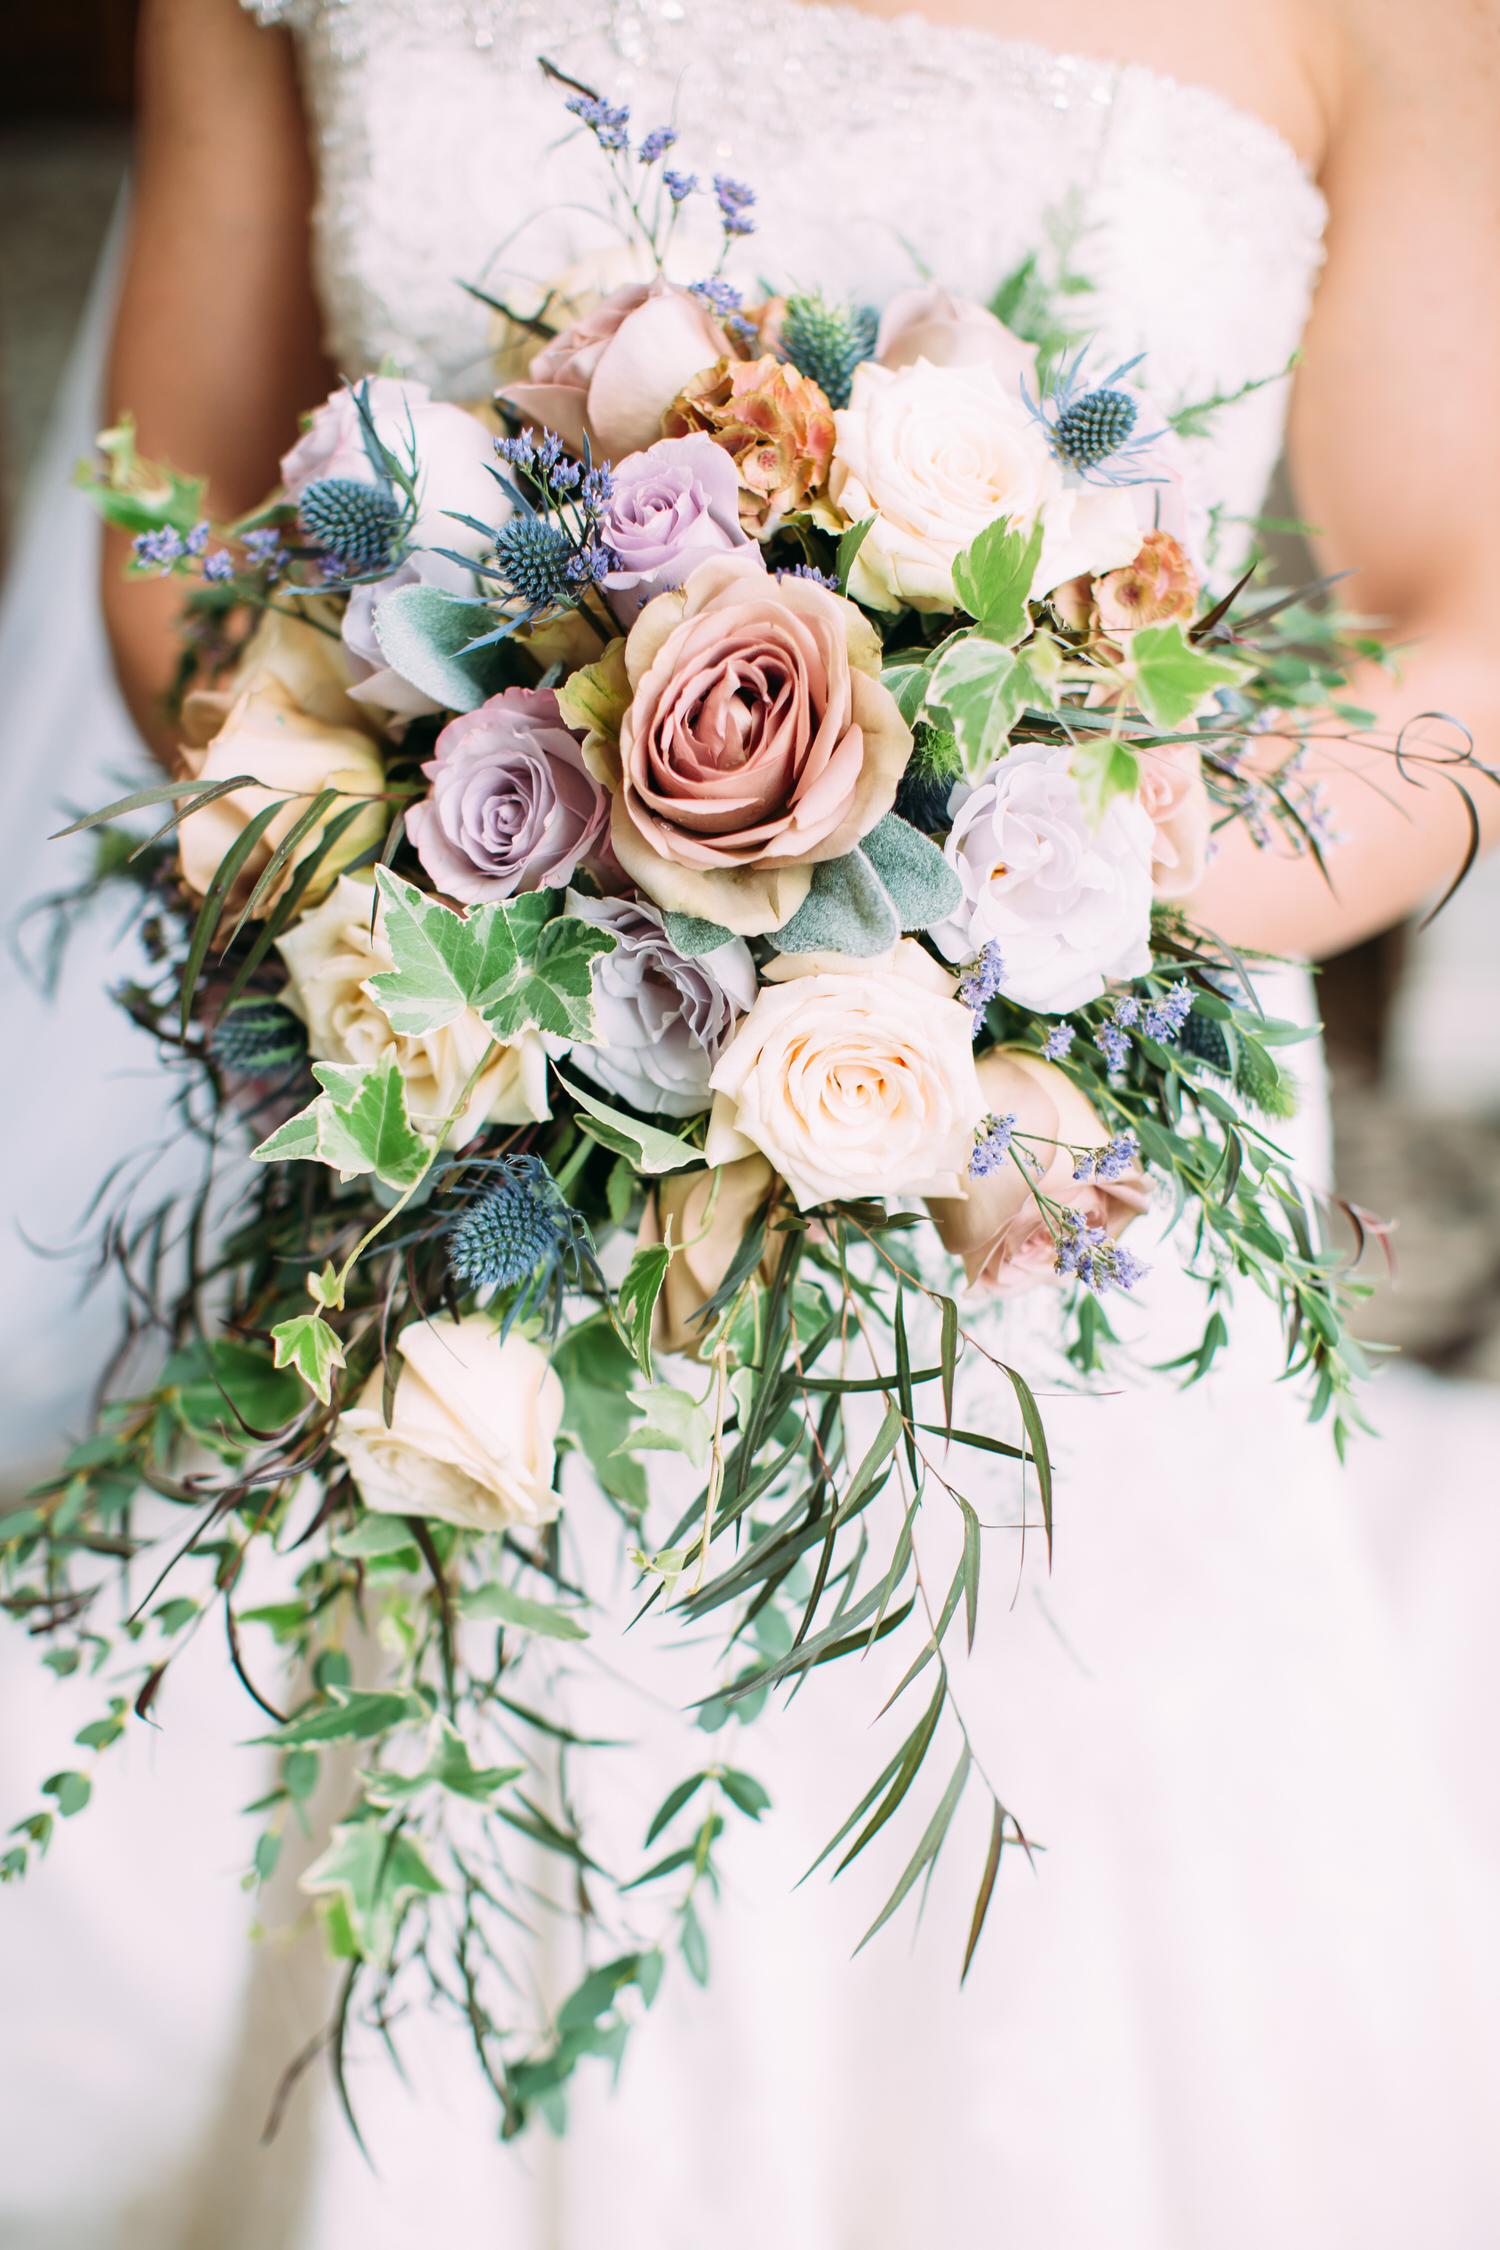 Wedding Bouquet. Chicago wedding photographer